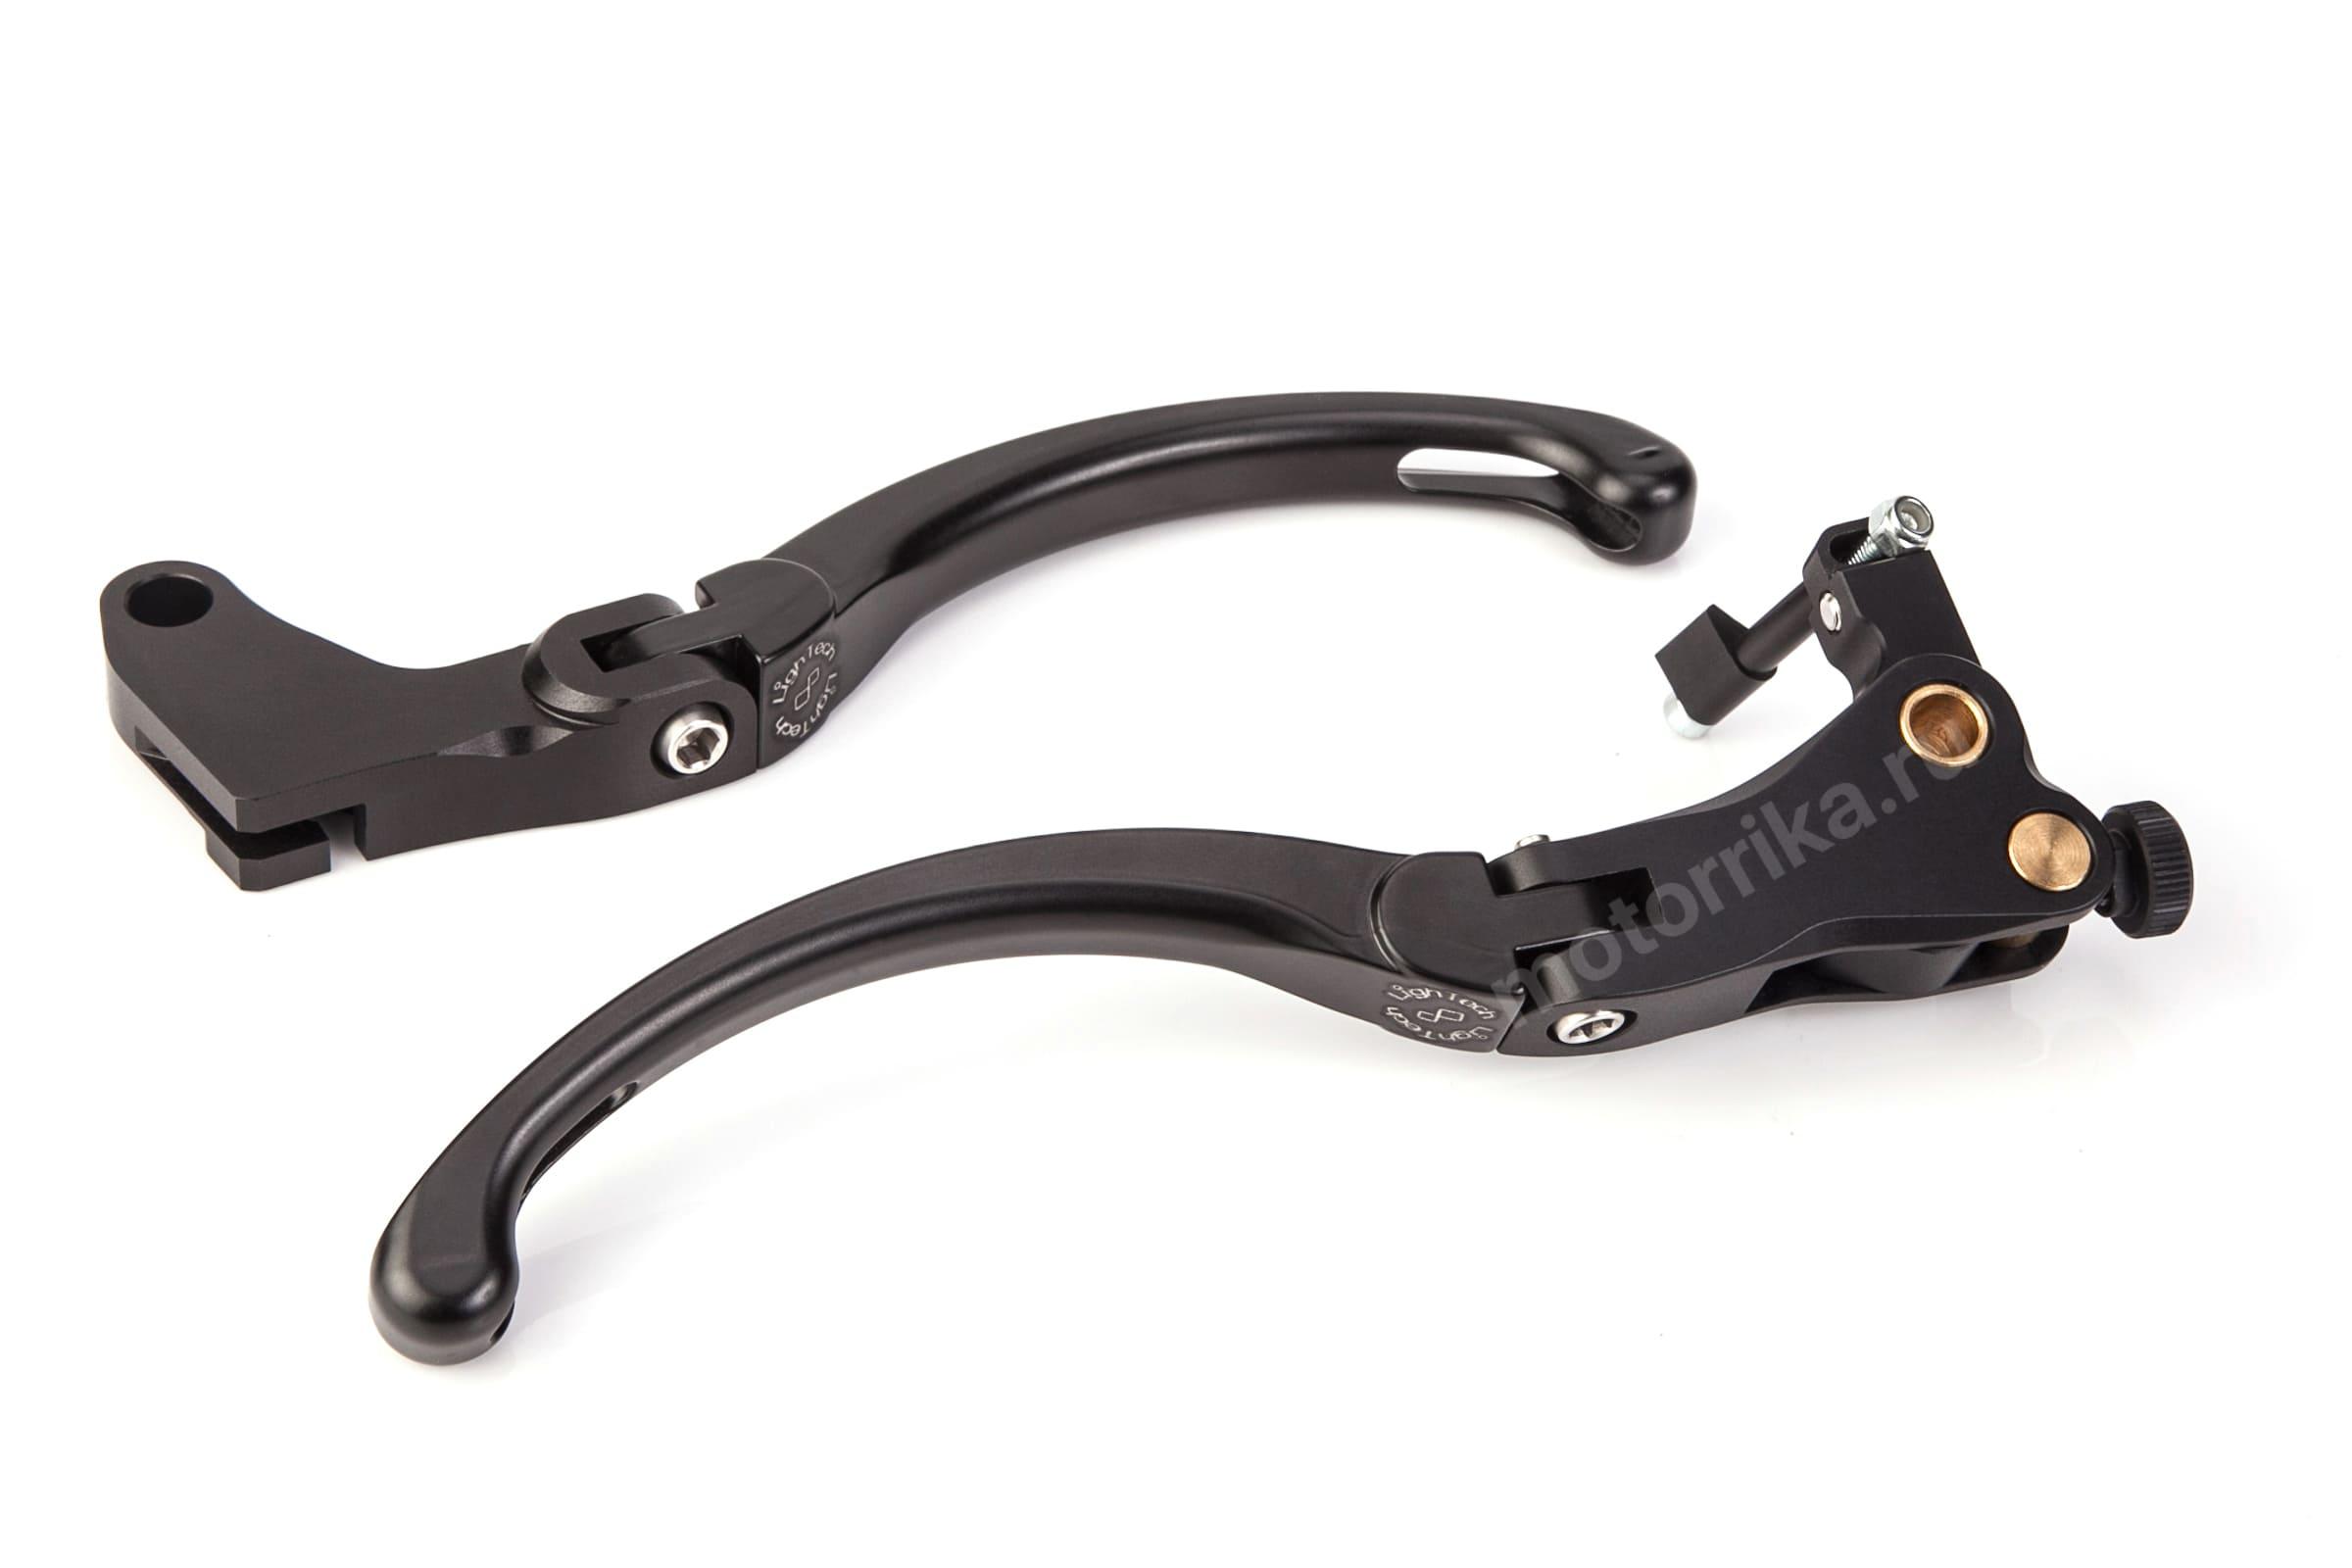 Комплект рычагов Lightech для Honda CBR1000RR 08-14, CBR1000RR ABS 08-14, CBR600RR 07-14, CBR600RR ABS 09-14